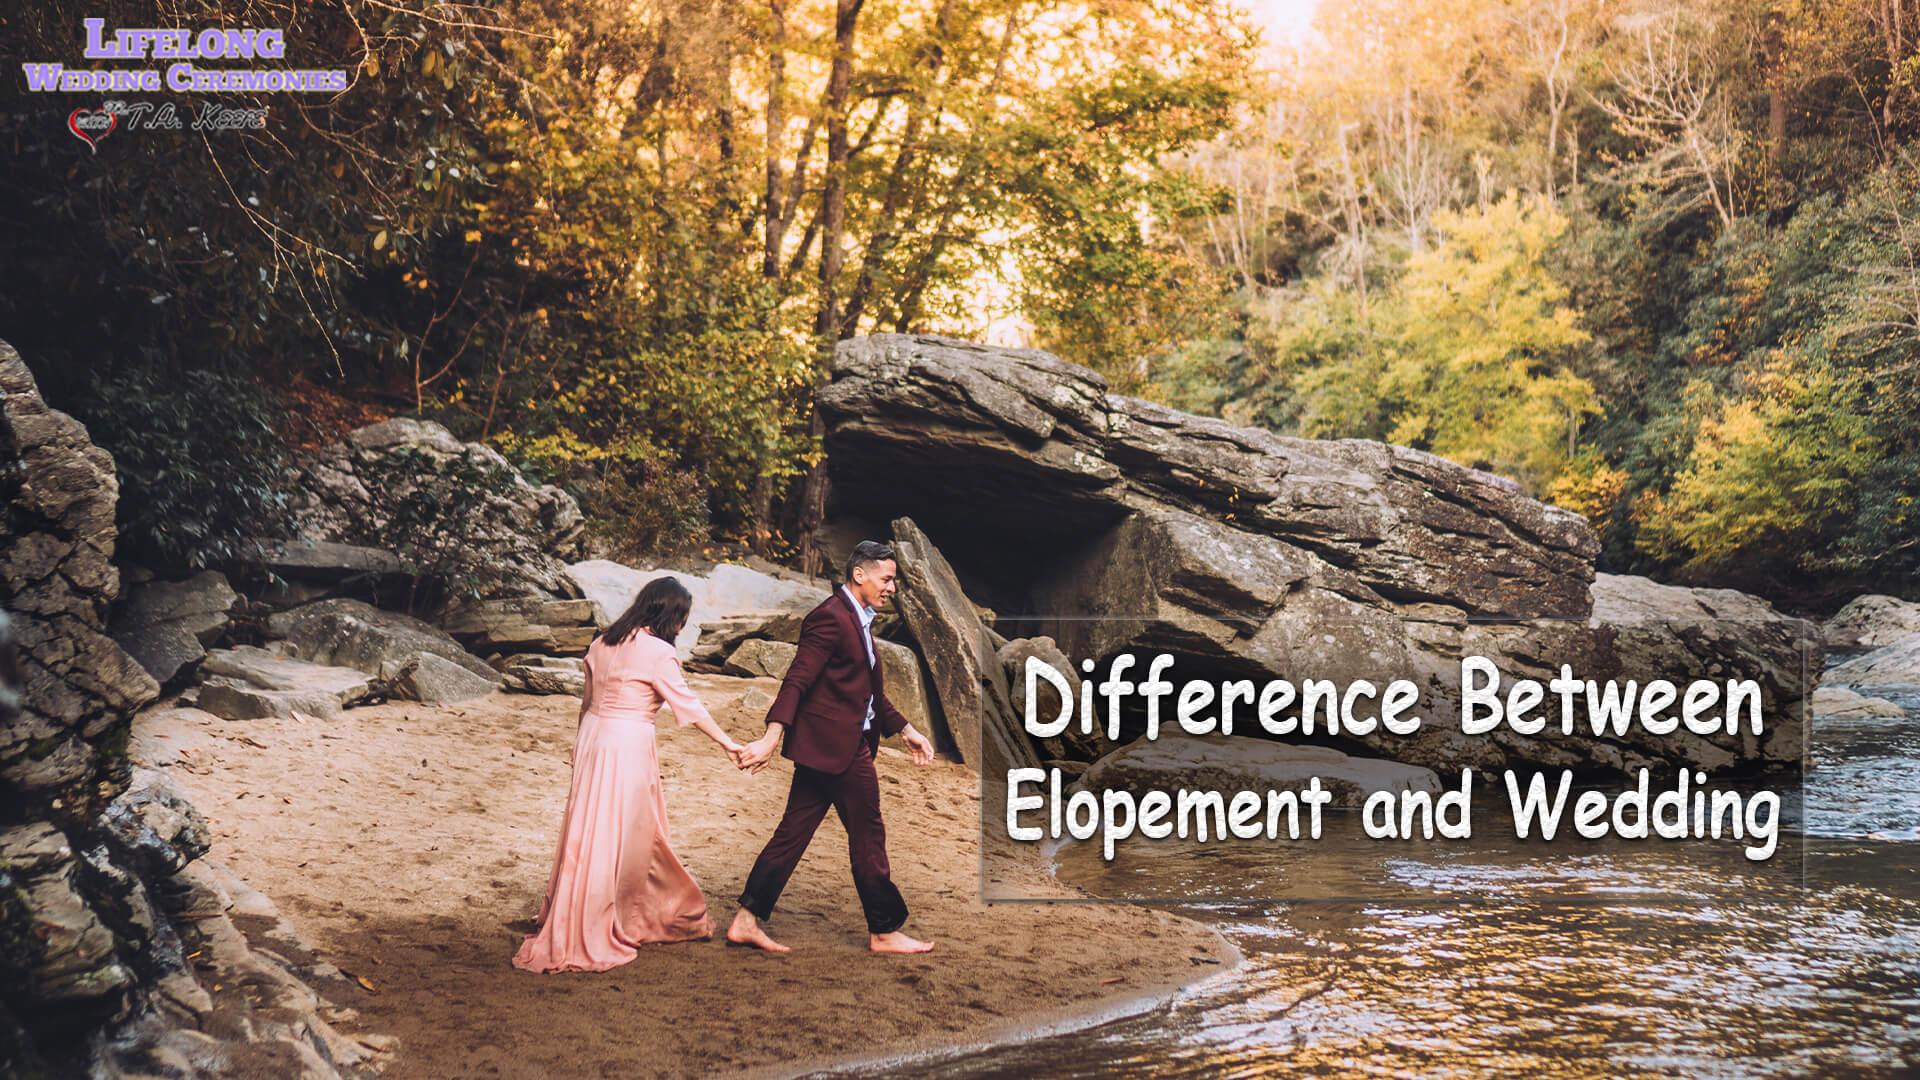 Elopement and Wedding